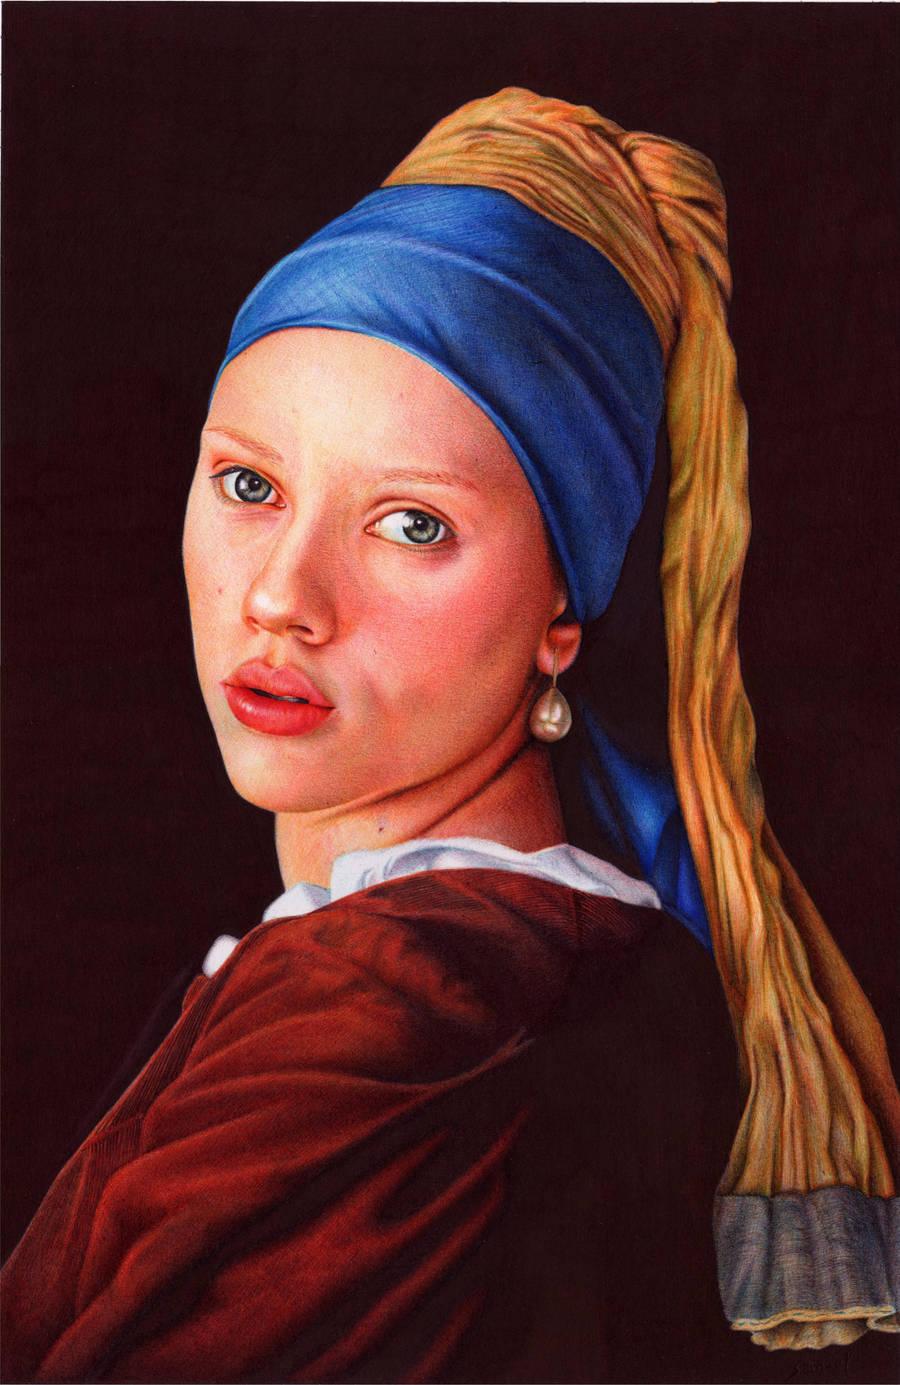 Girl With a Pearl Earring - Ballpoint Pen by VianaArts